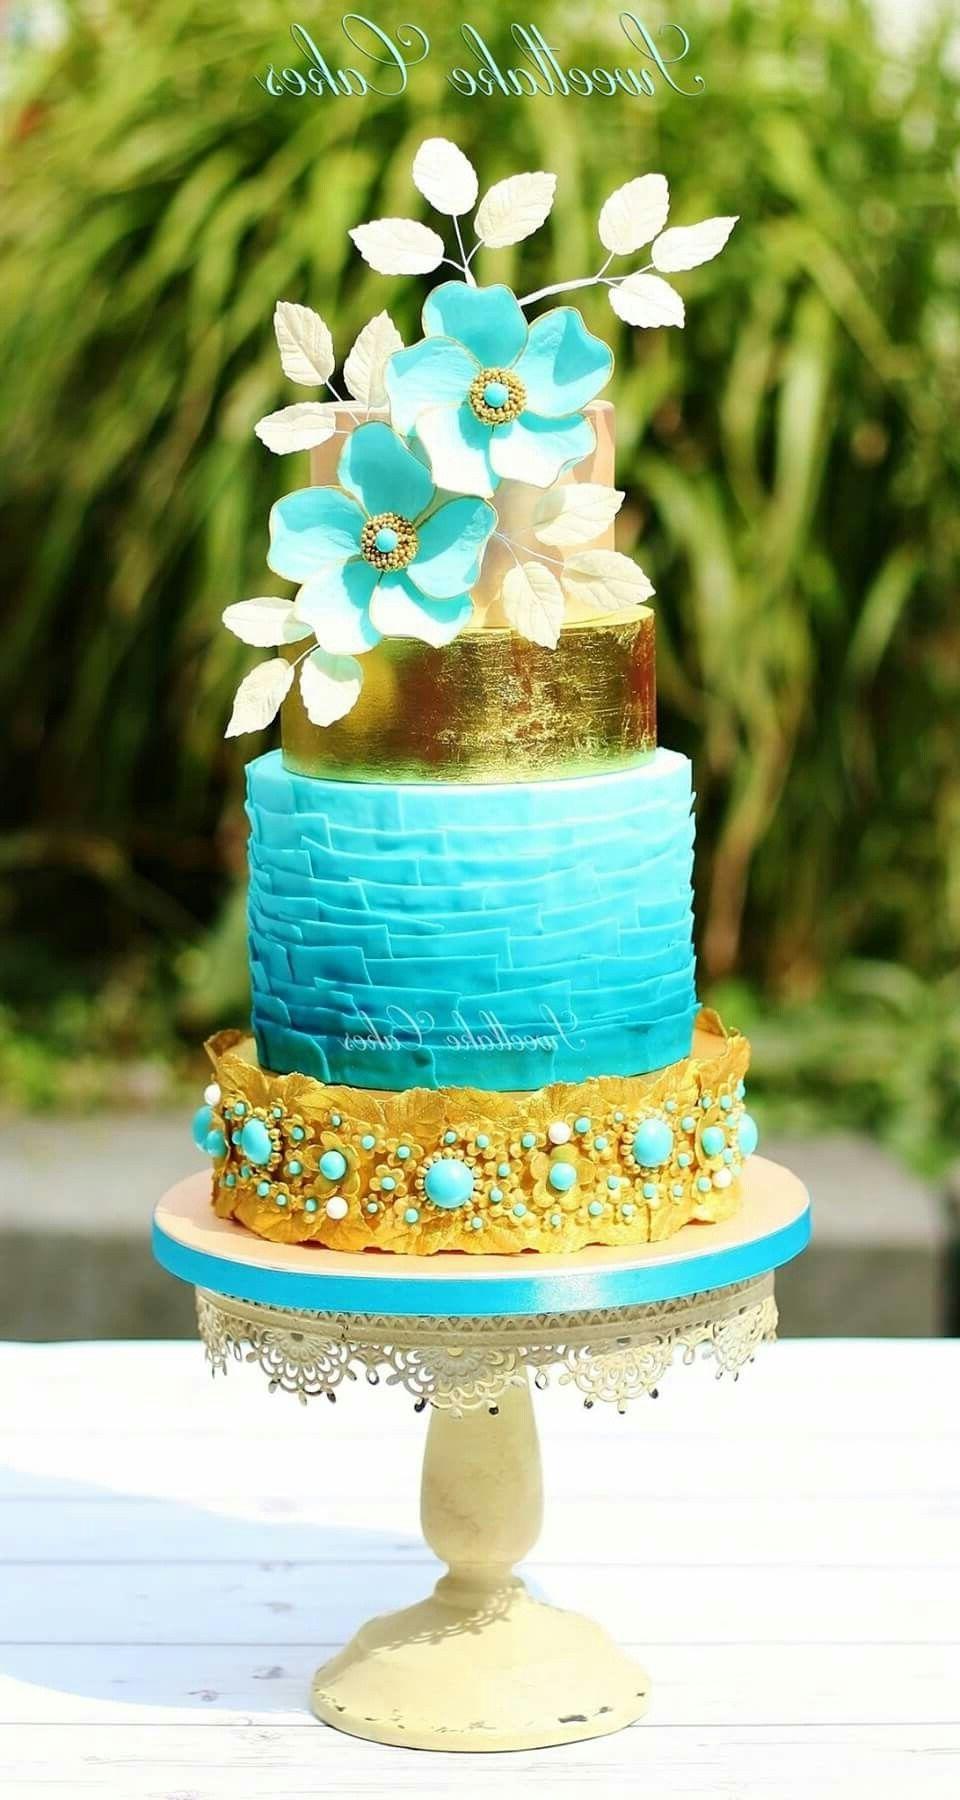 Wedding Cake Supplies Hobart Wedding Dress Pinterest Cake - Wedding Cakes Hobart